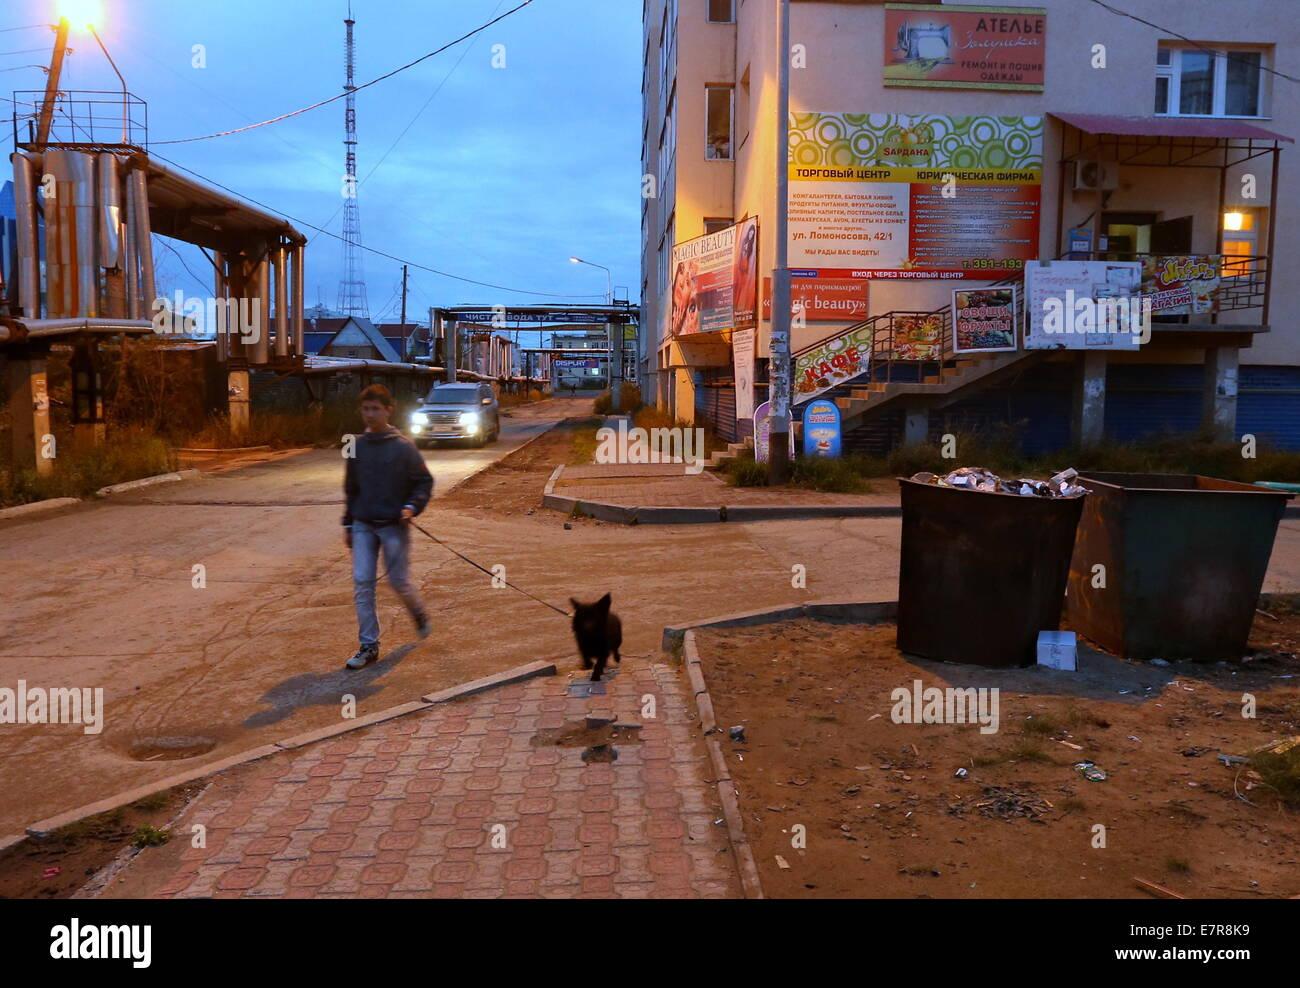 Yakutsk, Russia. 23rd Sep, 2014. A man walking his dog. © Valery Sharifulin/ITAR-TASS/Alamy Live News - Stock Image